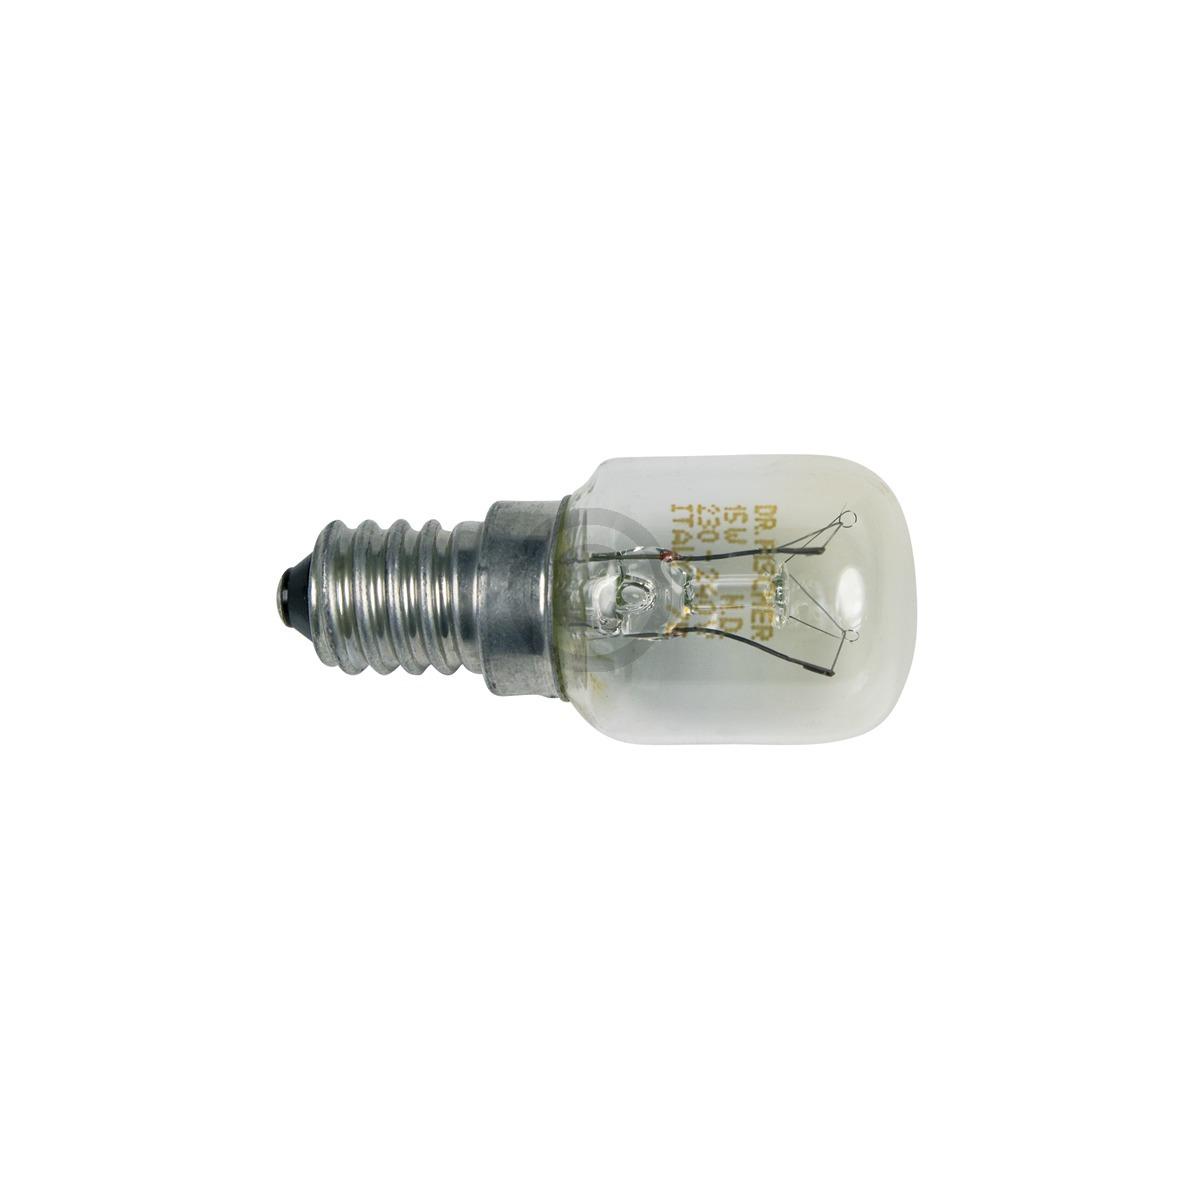 Lampe E14 15W Bosch 00602674 25mmØ 57mm 230V für Kühlschrank Gefrierschrank etc